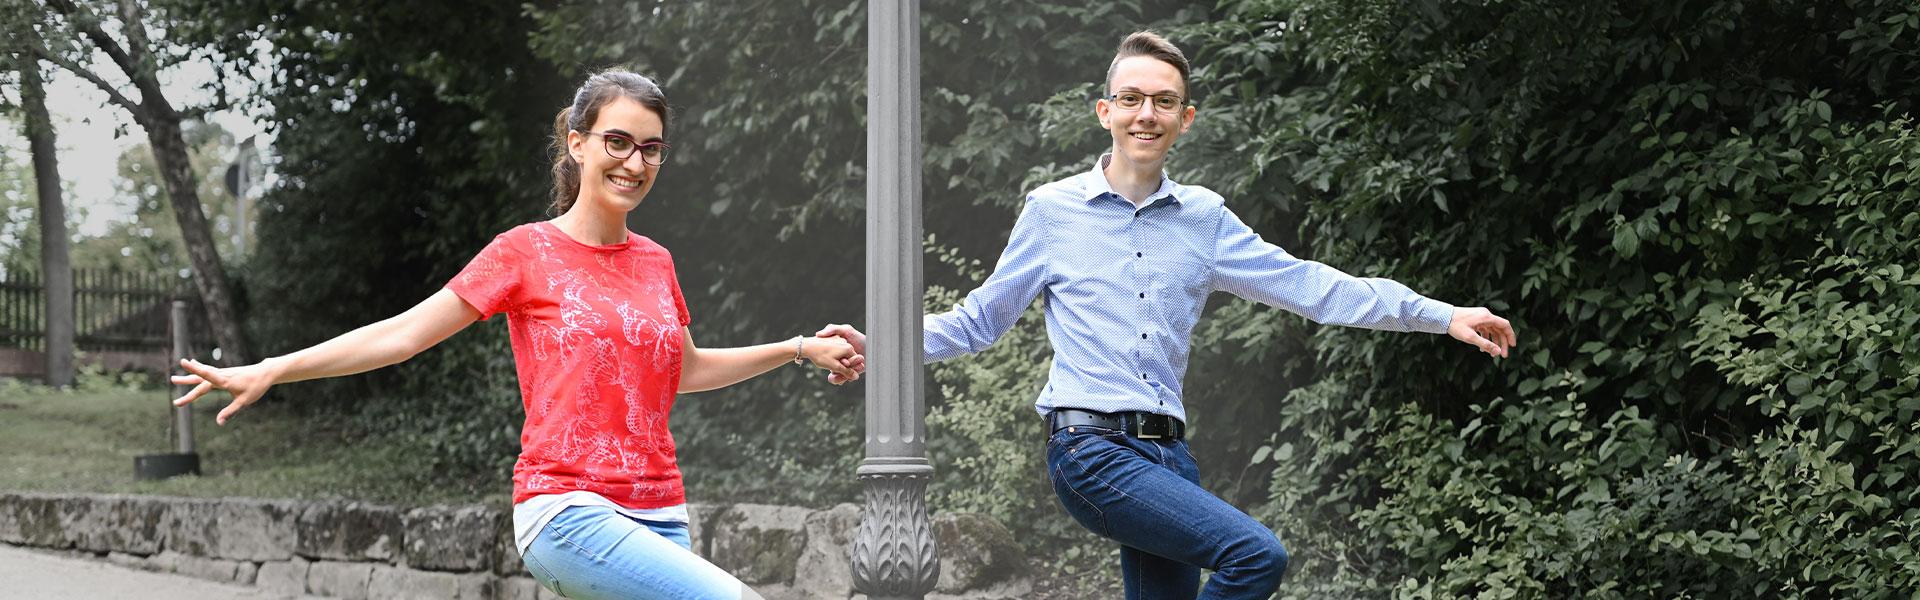 Tanzpartnerbörse Ansbach